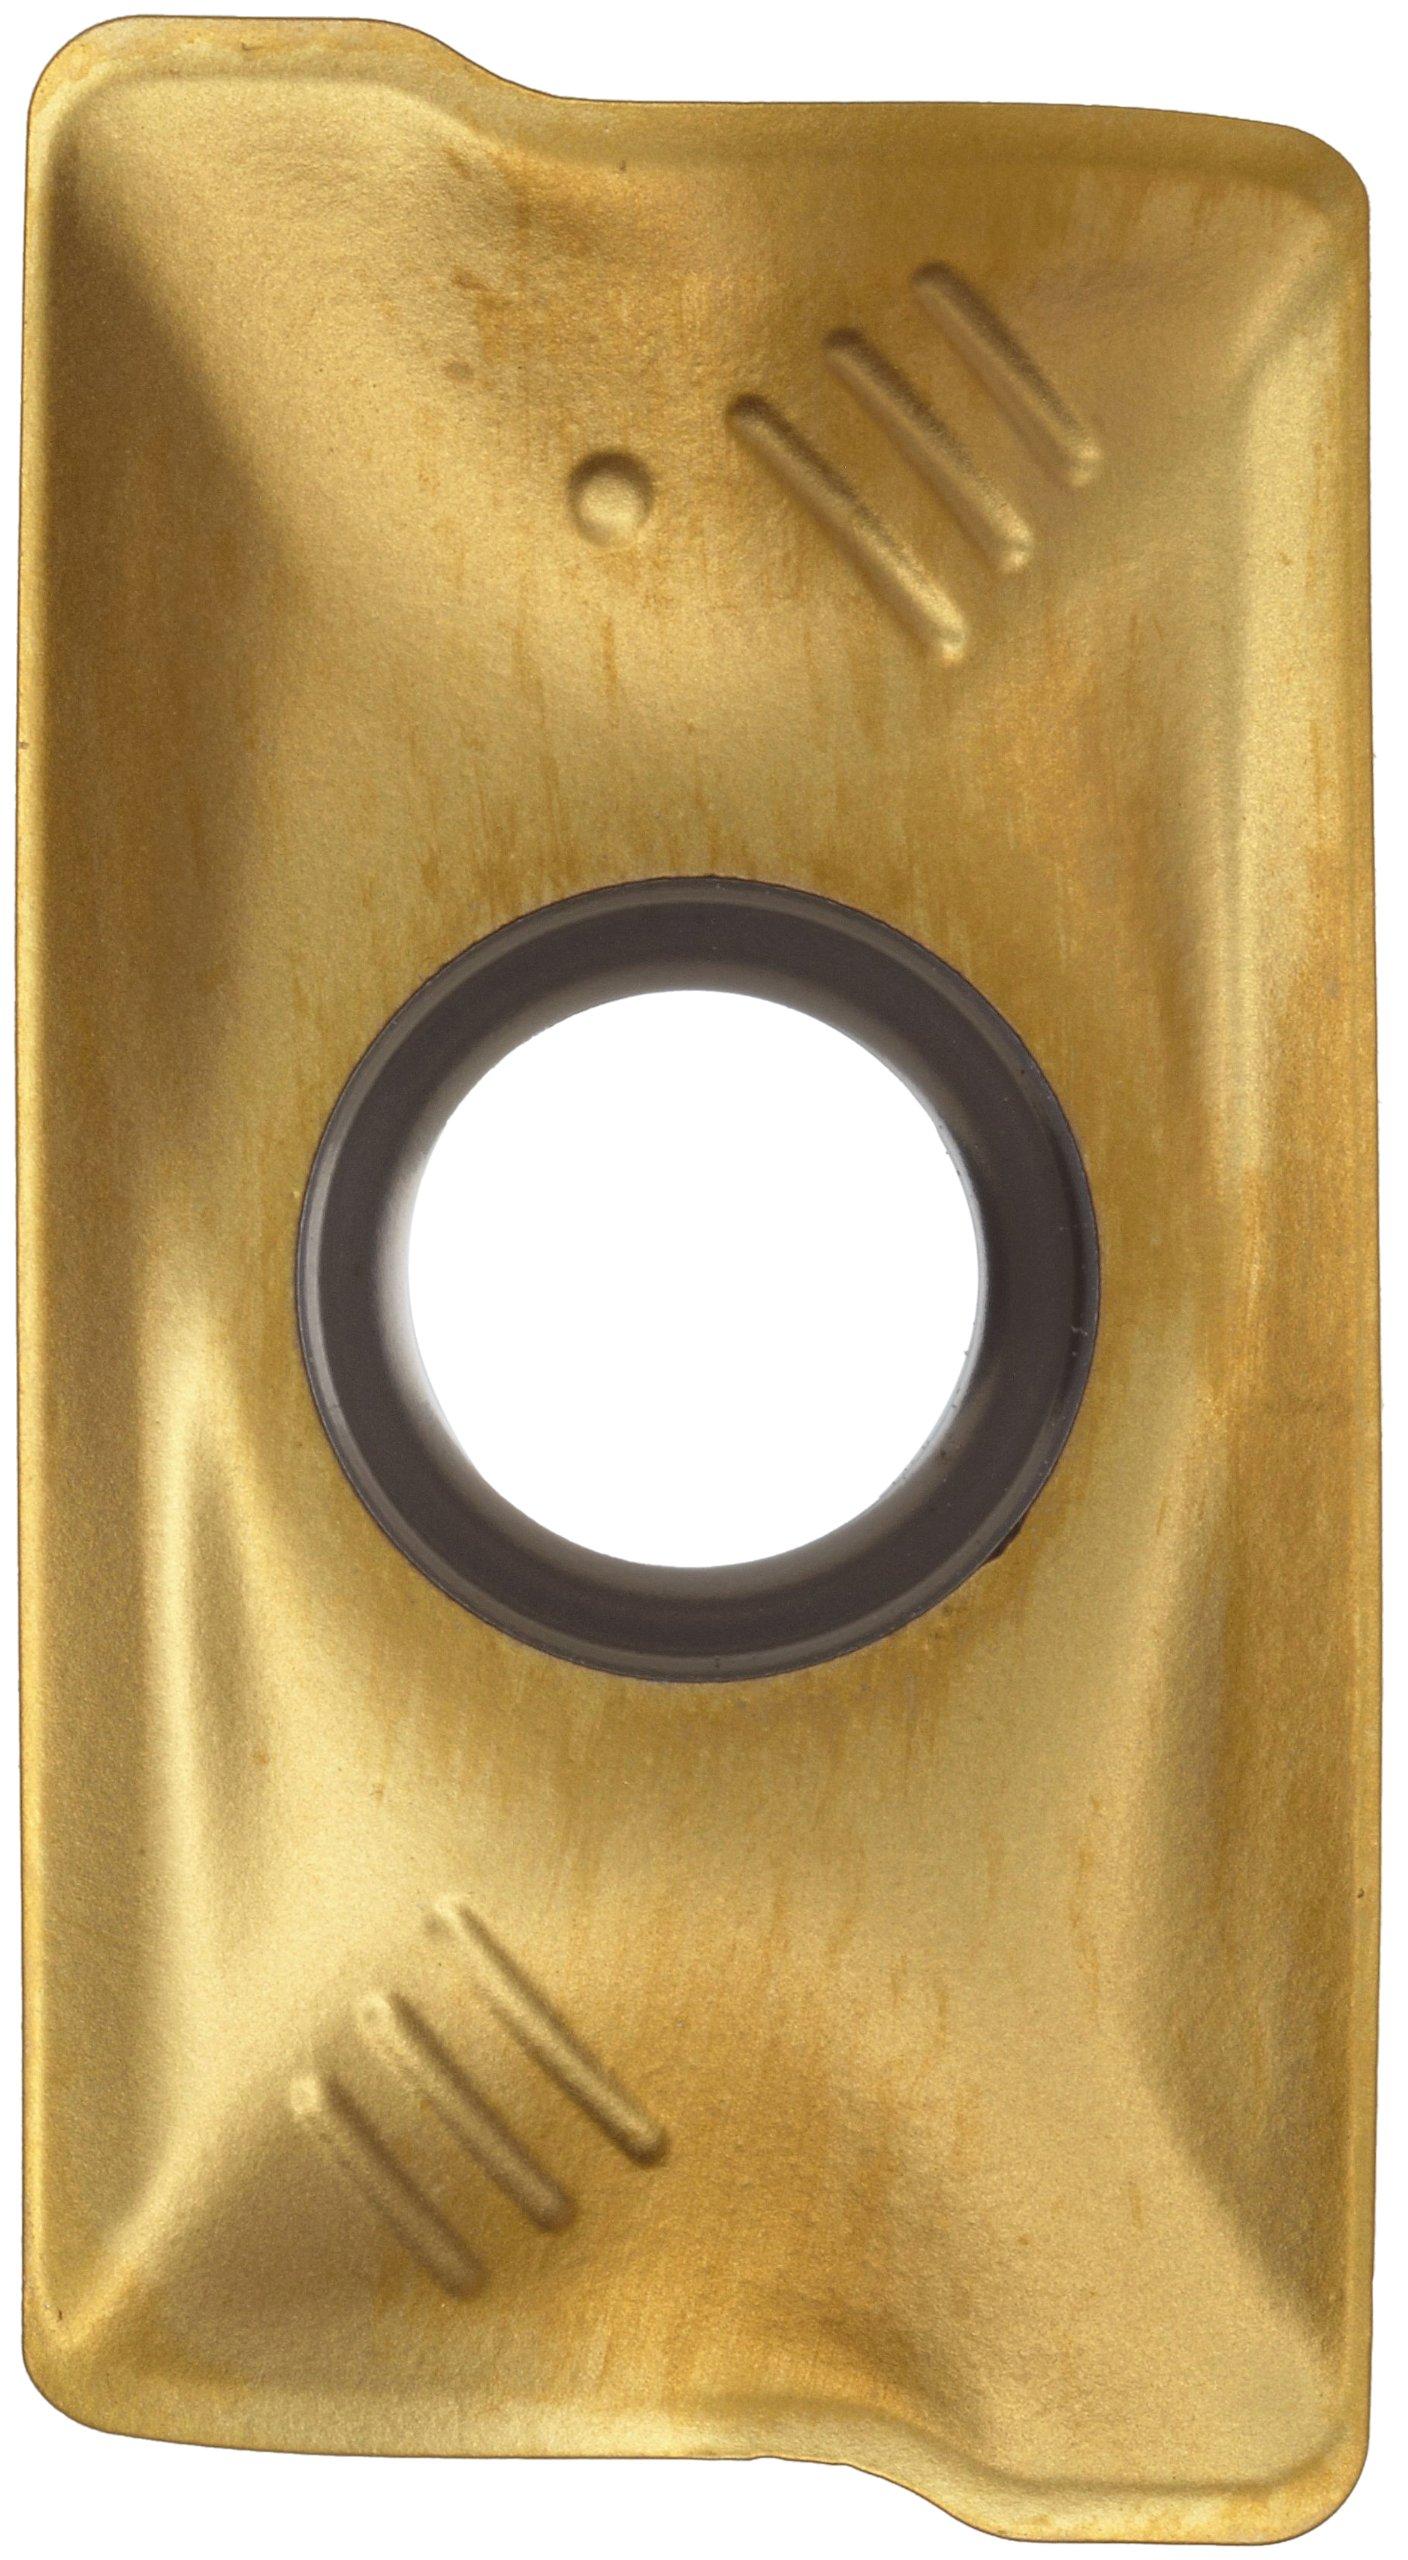 Sandvik Coromant COROMILL Carbide Milling Insert, R390 Style, Rectangular, GC1025 Grade, TiAlN Coating, R39011T308MPM,0.141'' Thick, 0.031'' Corner Radius (Pack of 10)